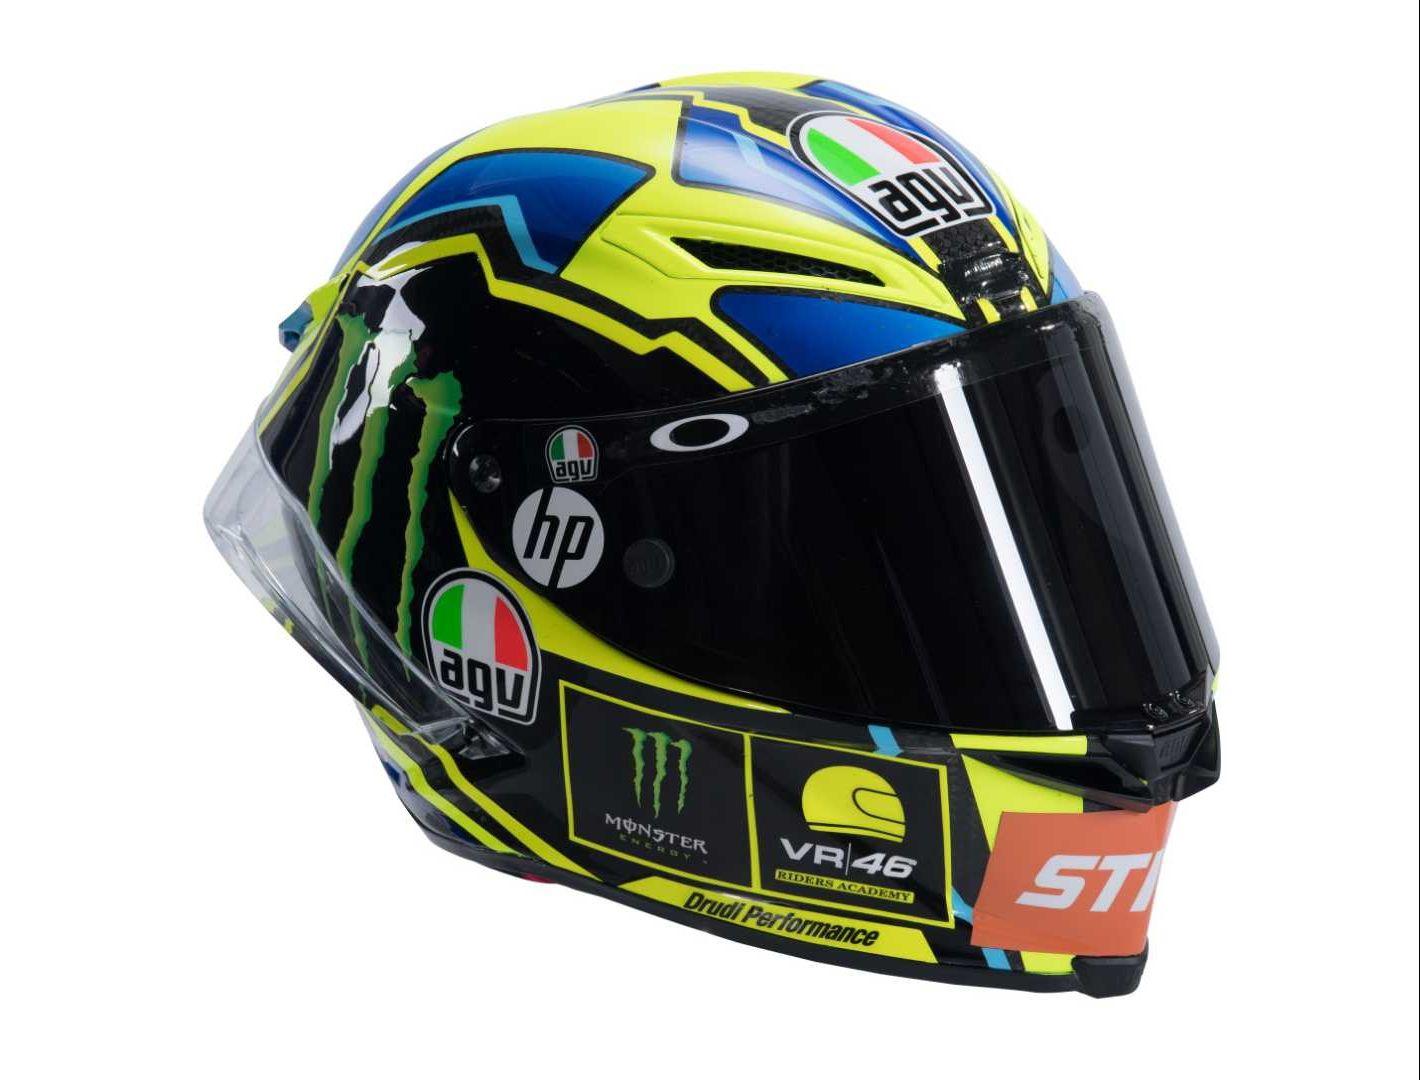 AGV Lorenzo Baldassarri 7 Racing Helmets, Racing Motorcycles, Motorcycle  Helmets, Biker Gear, df8795952694